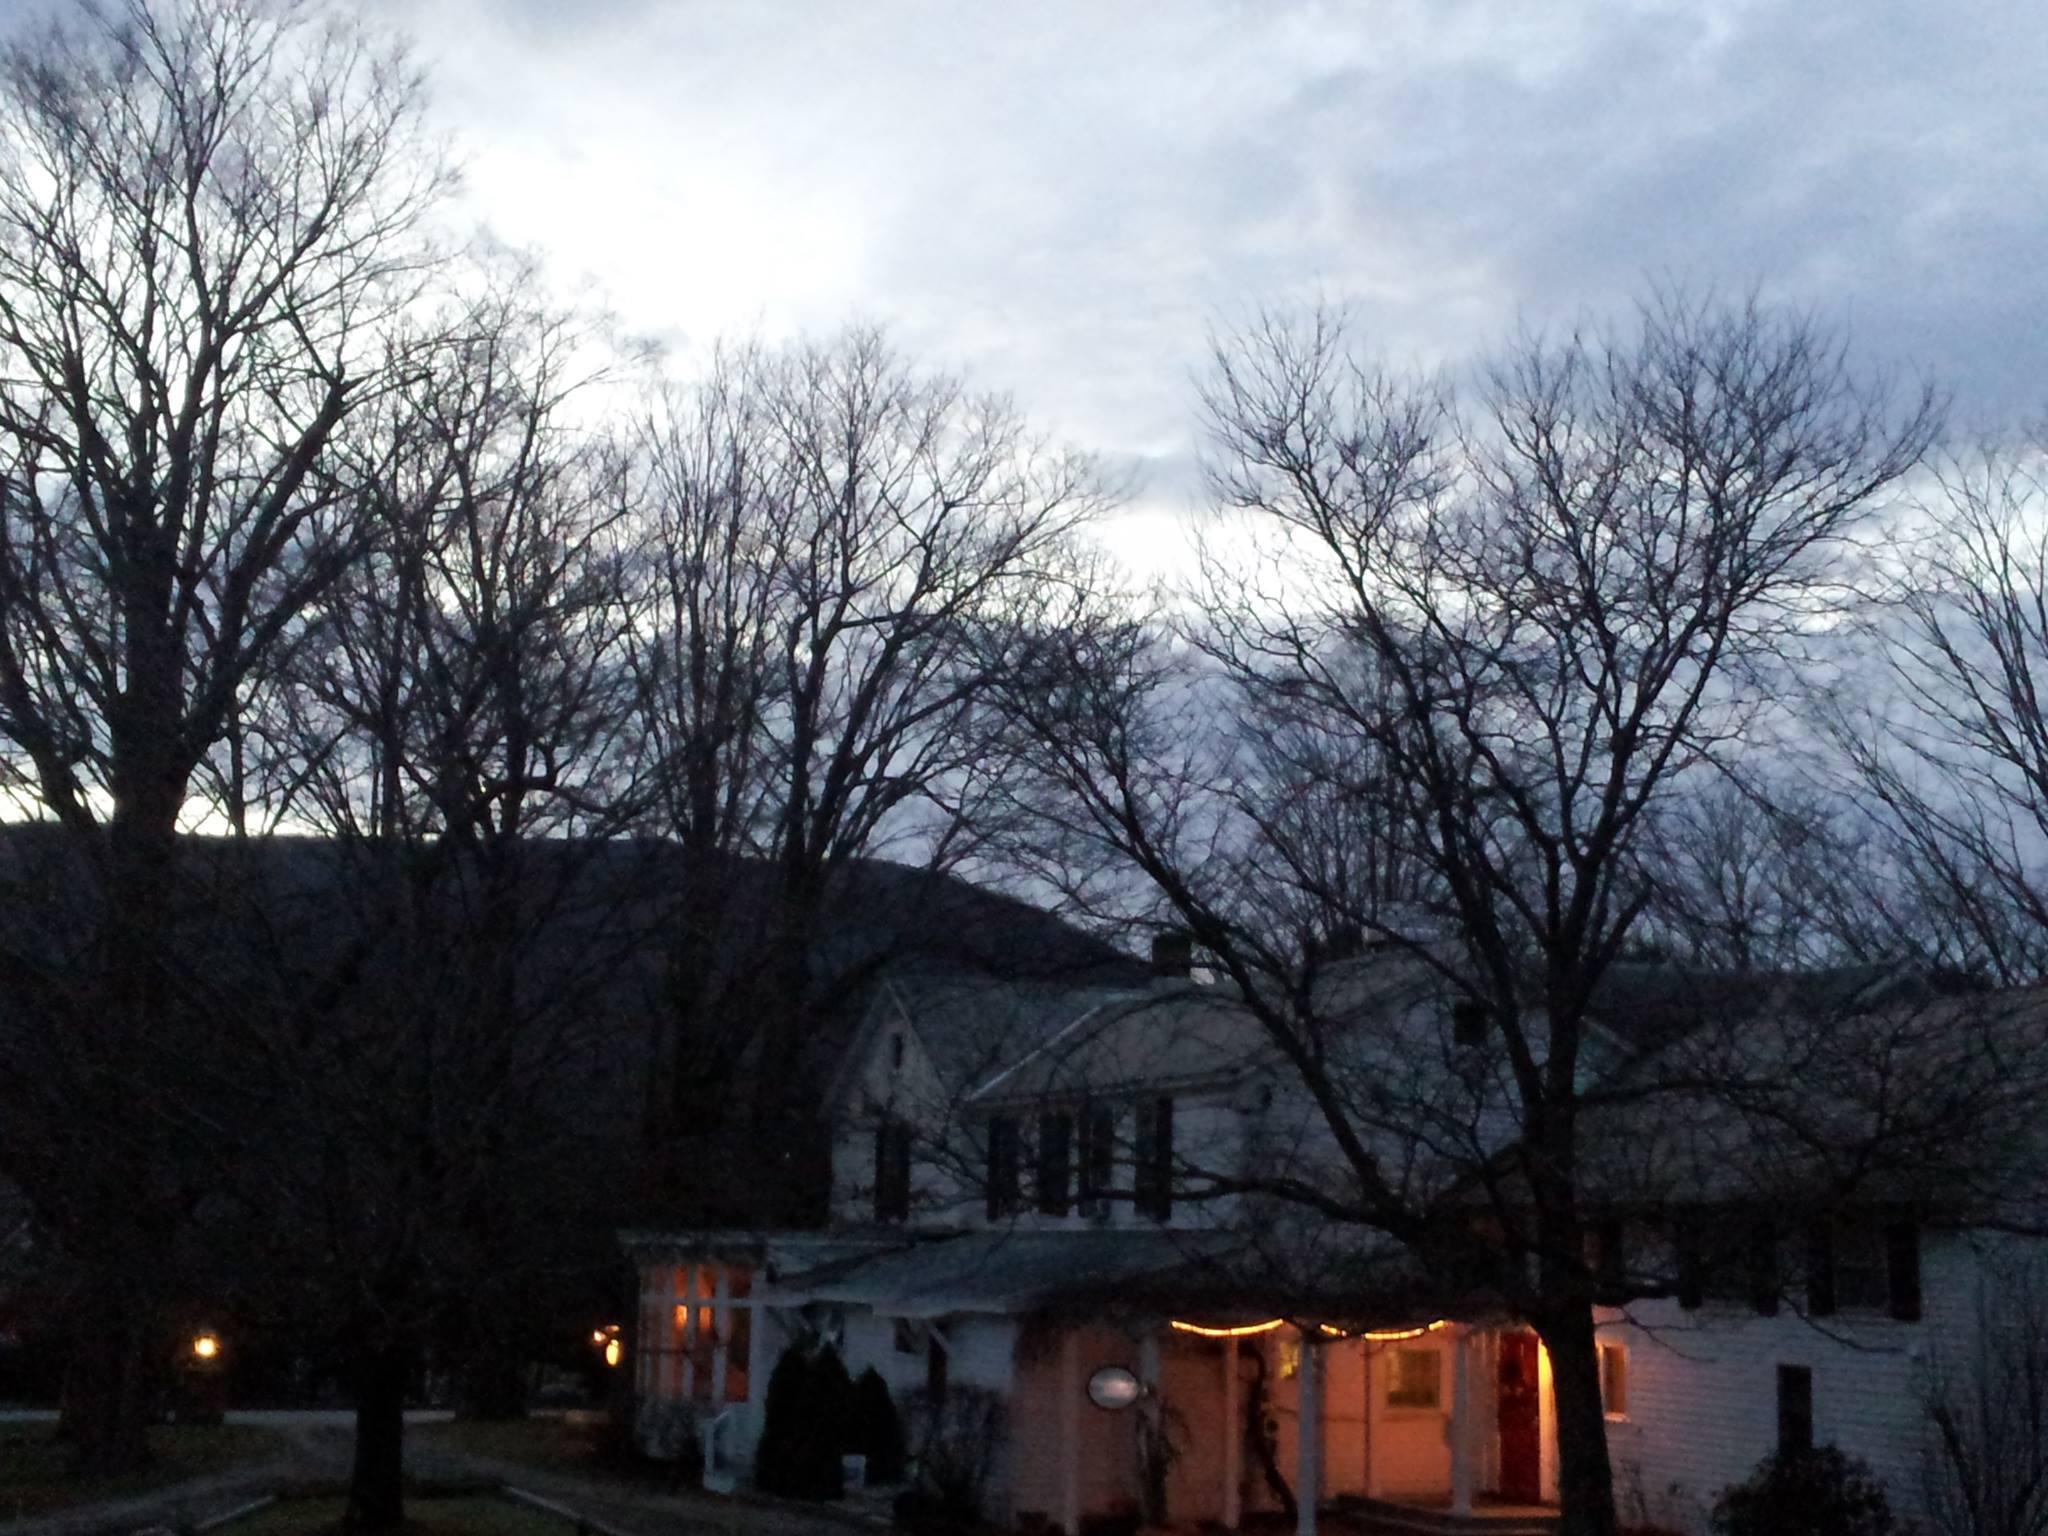 A November night at Dorset's Inn at West View Farm.